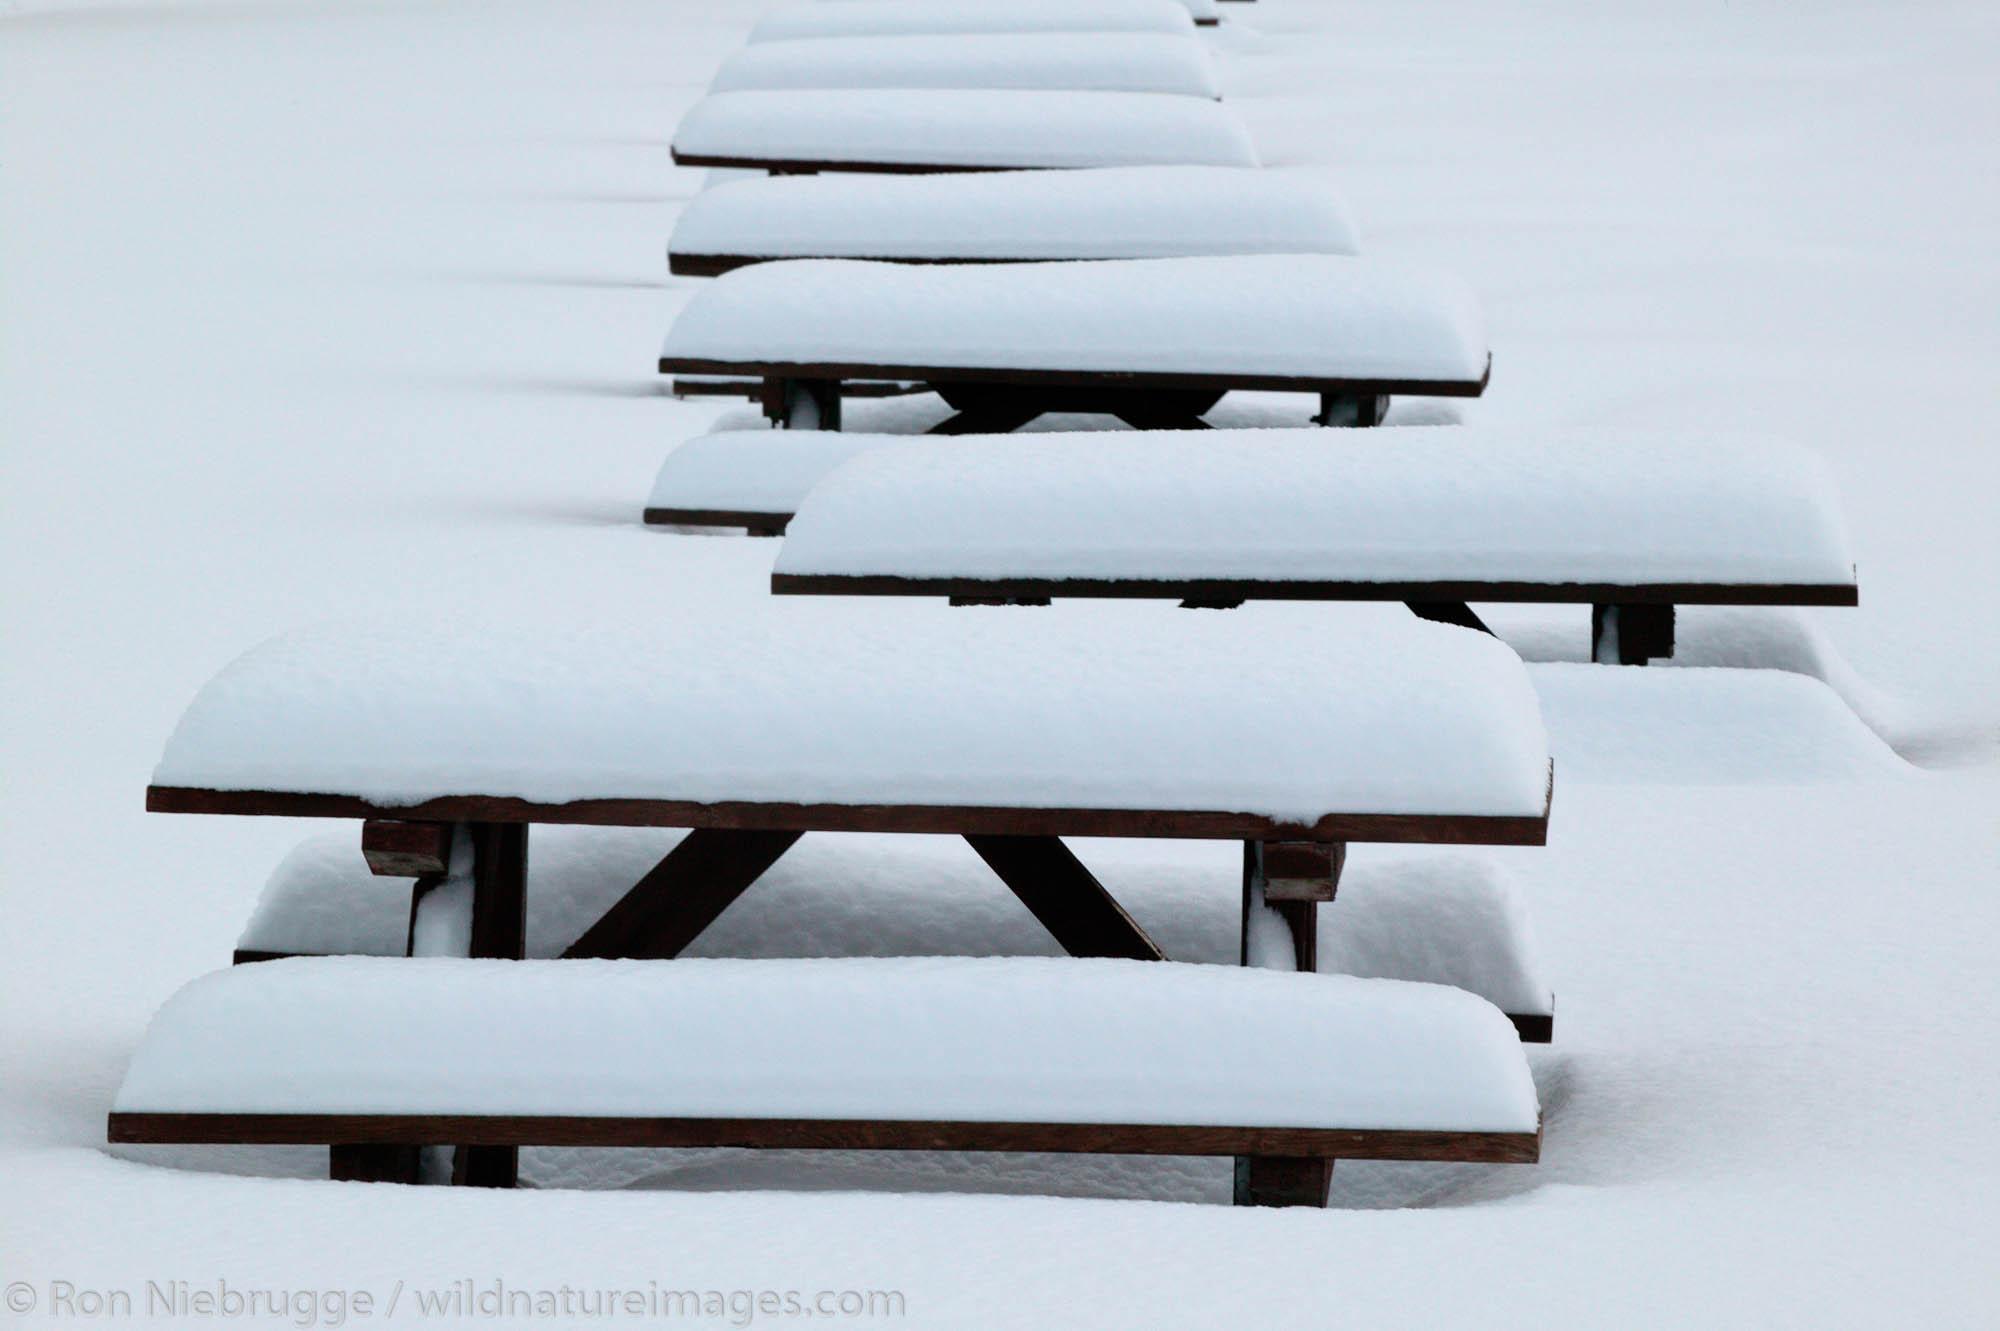 Picnic tables during the winter in Seward, Alaska.